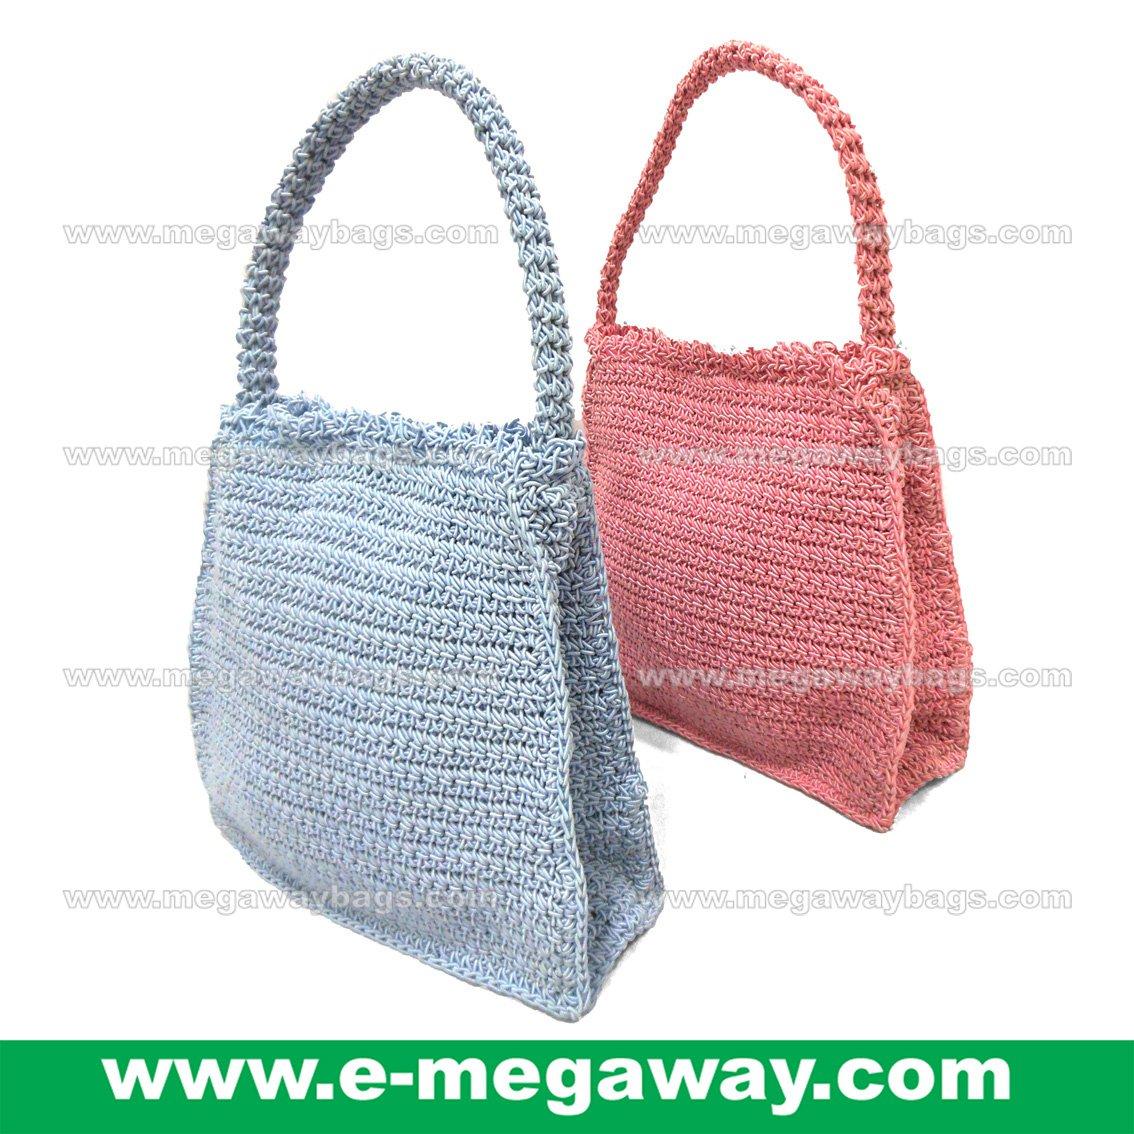 Mini Crochet Bags Straw Knitted Crafts Tote Handbags Taschen Purses MegawayBags #CC-1044B